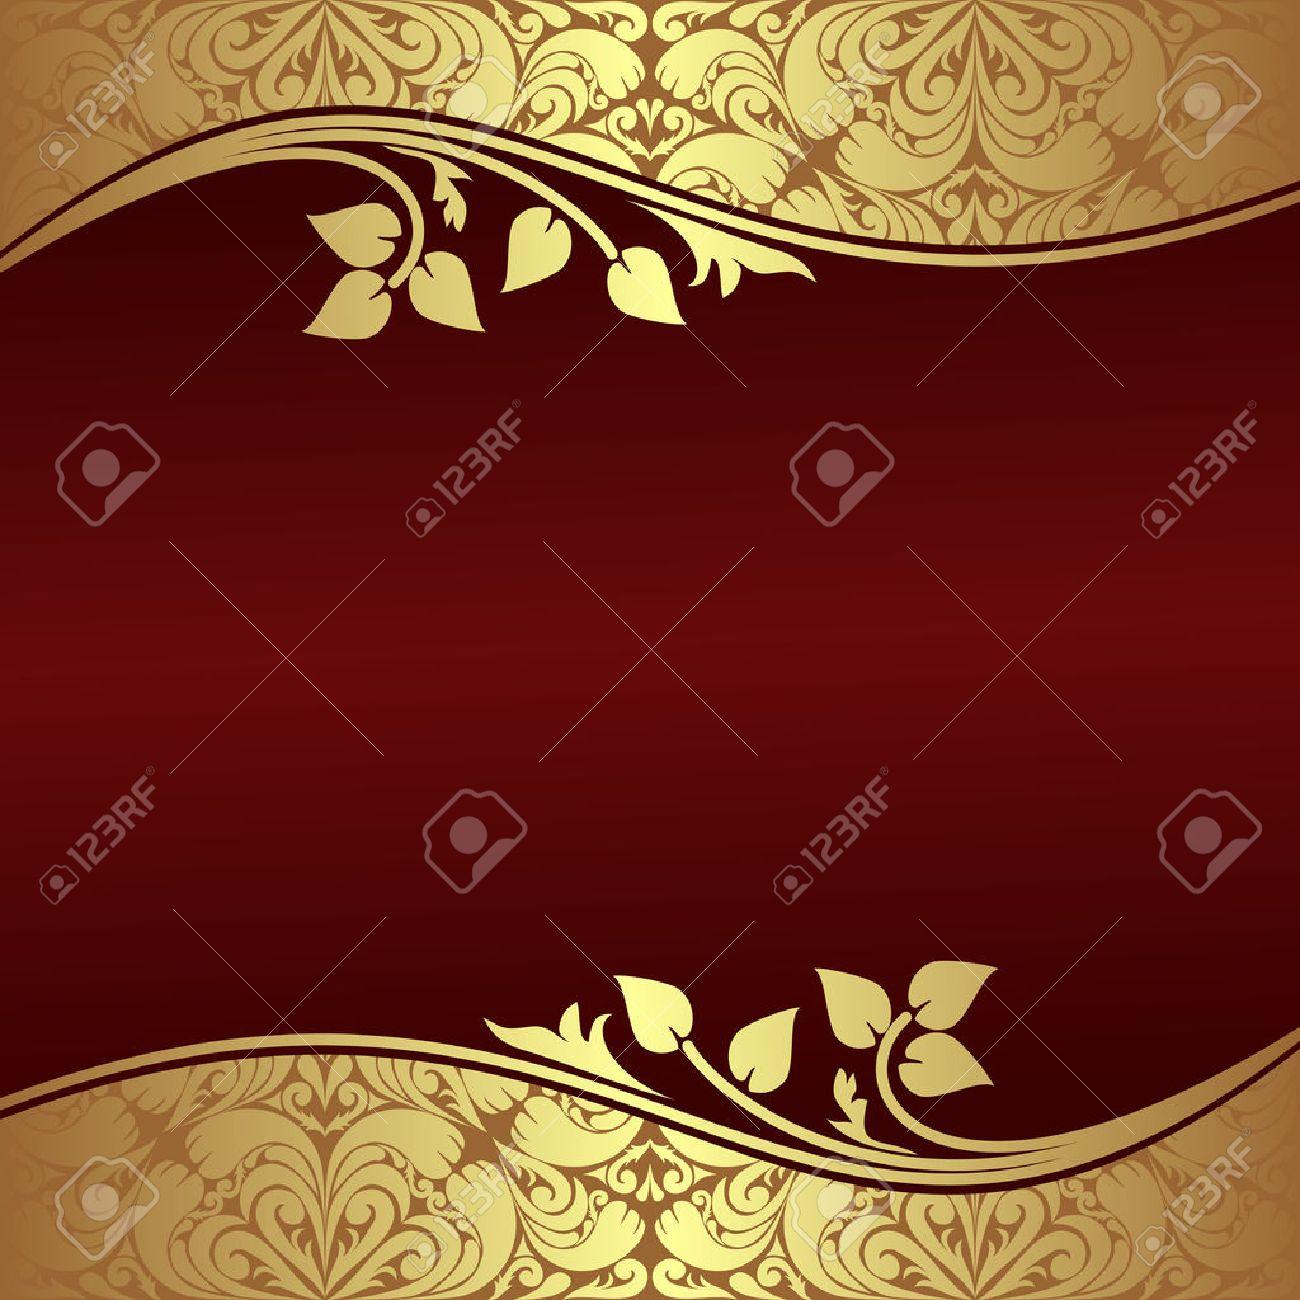 Elegant Background with floral golden Borders - 23660404